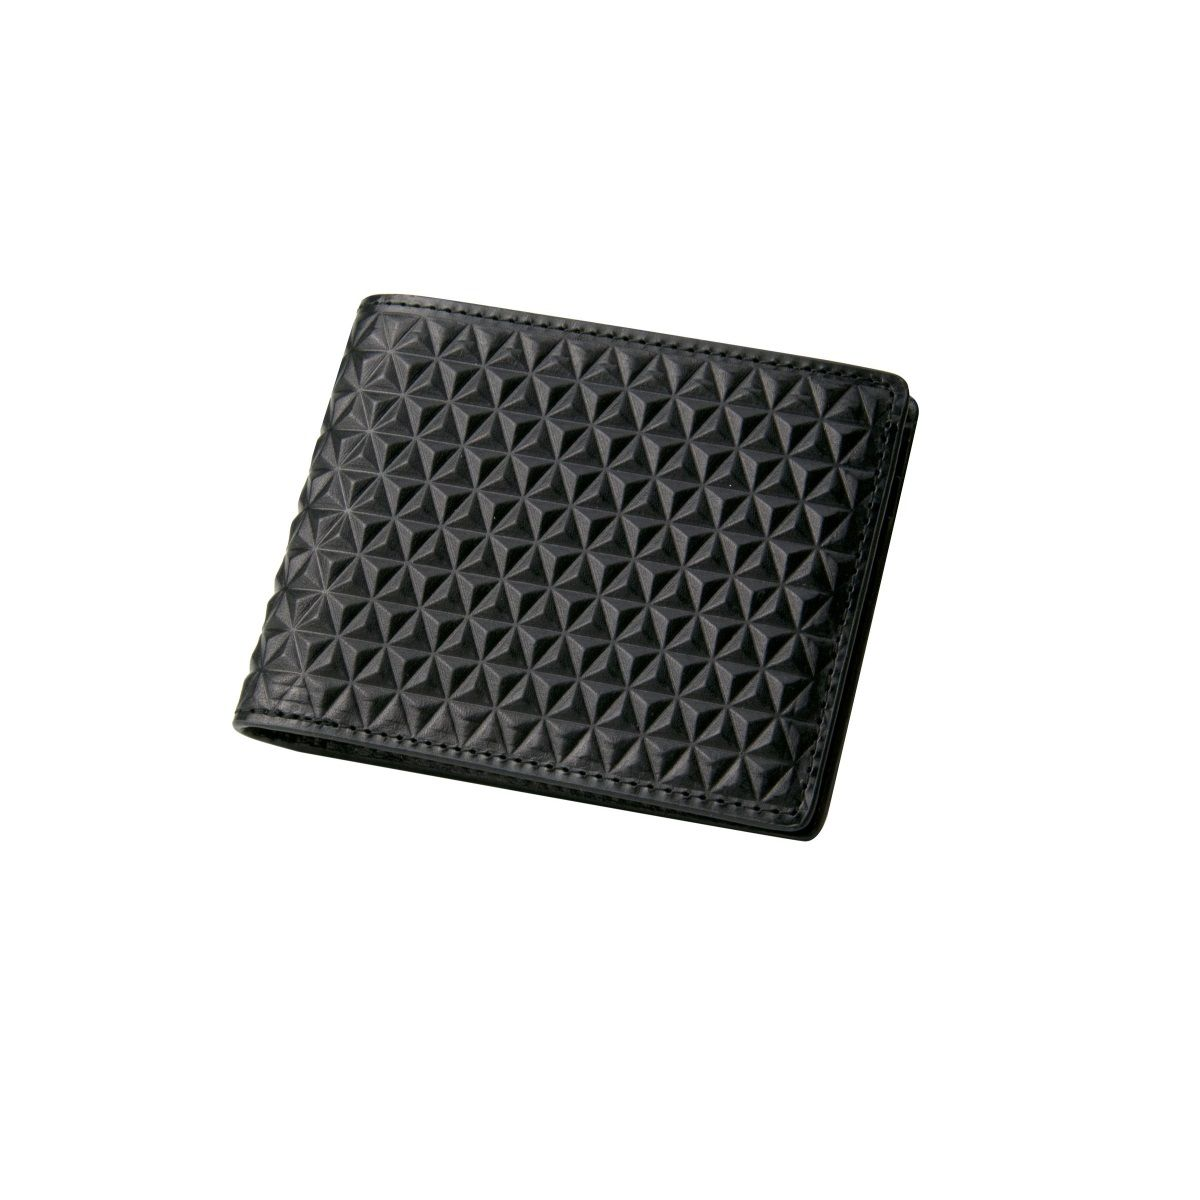 J.FOLD ארנק עור Tetra - שחור